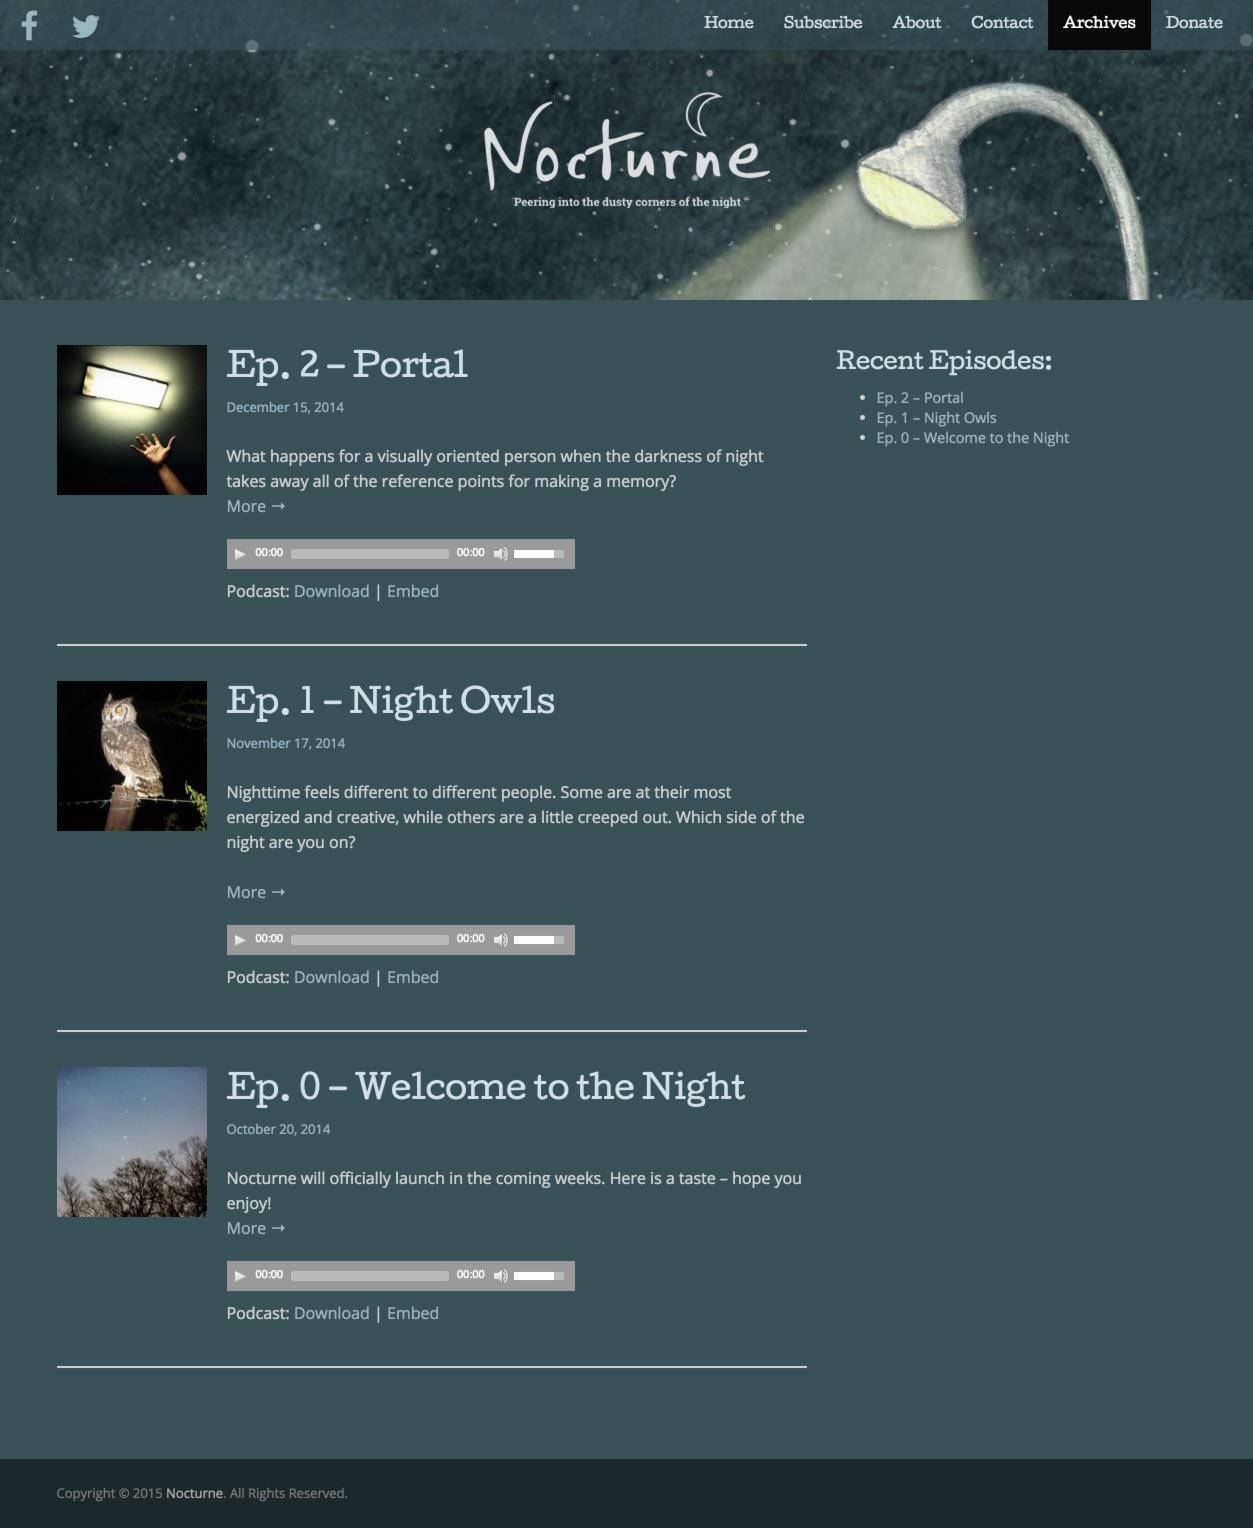 Eric Pedersen: Nocturne - Archives